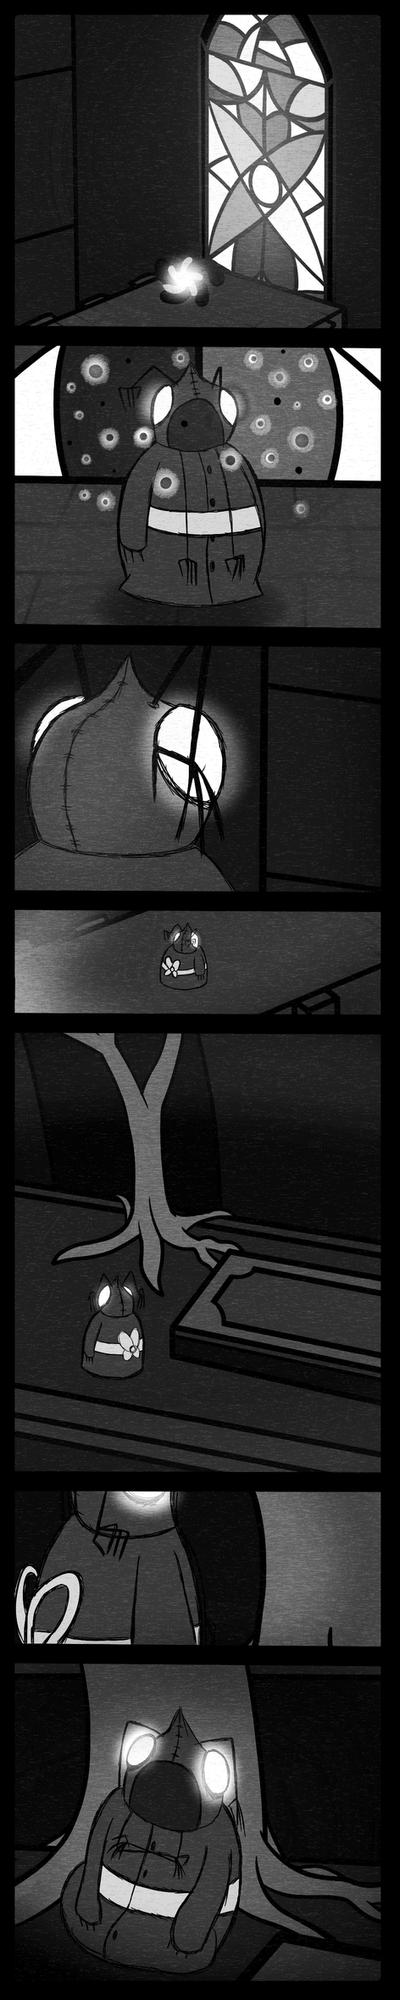 (HL OCT) 1 - Matryoshka is Alone by JamesOfGoo